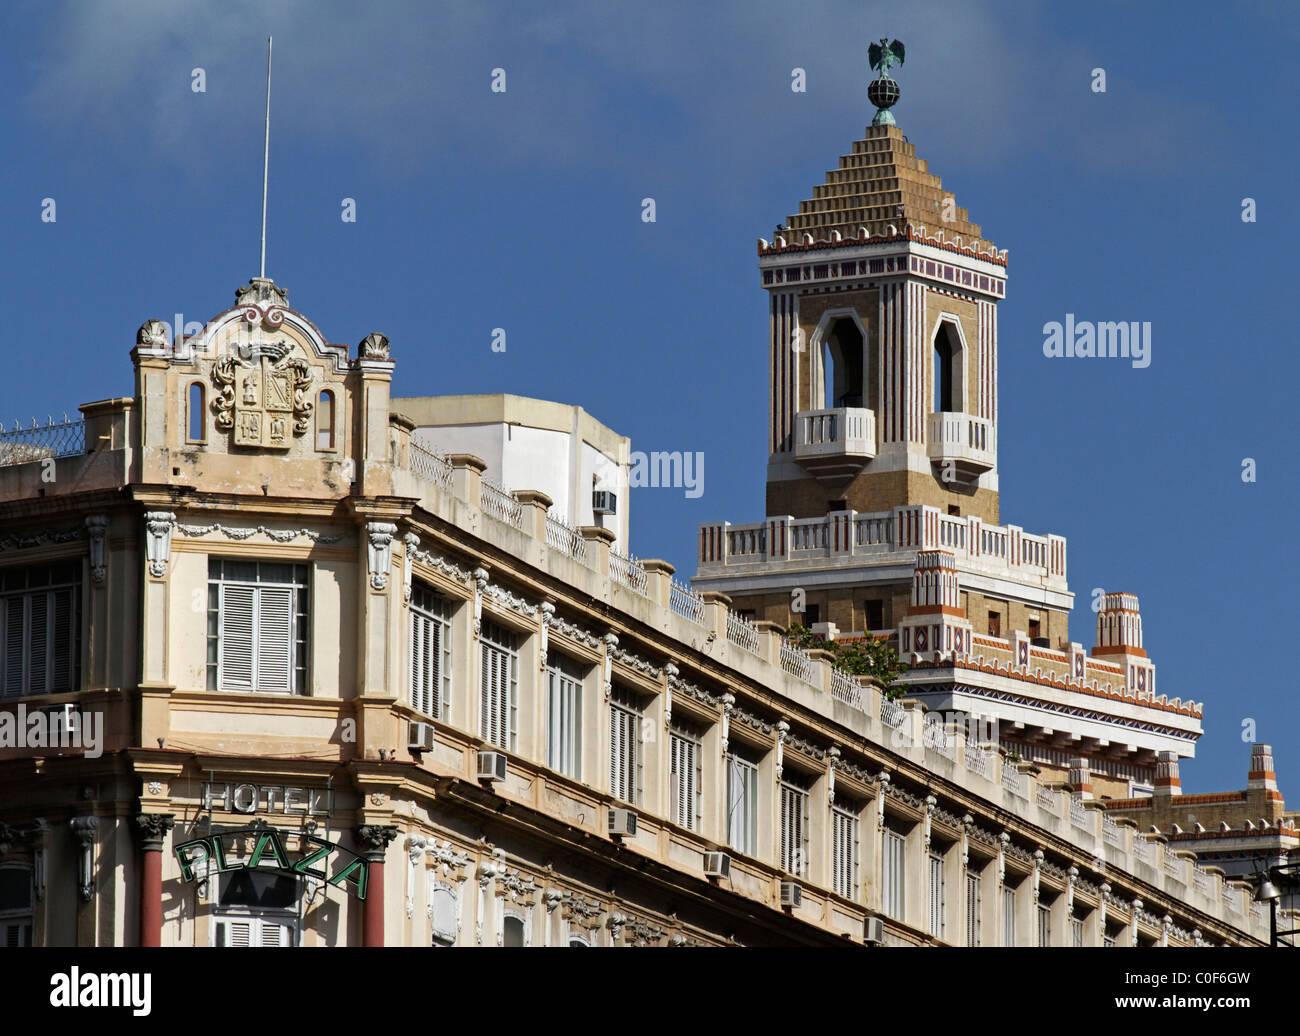 Barcadi Turm, Havanna Vieja, Kuba Stockfoto